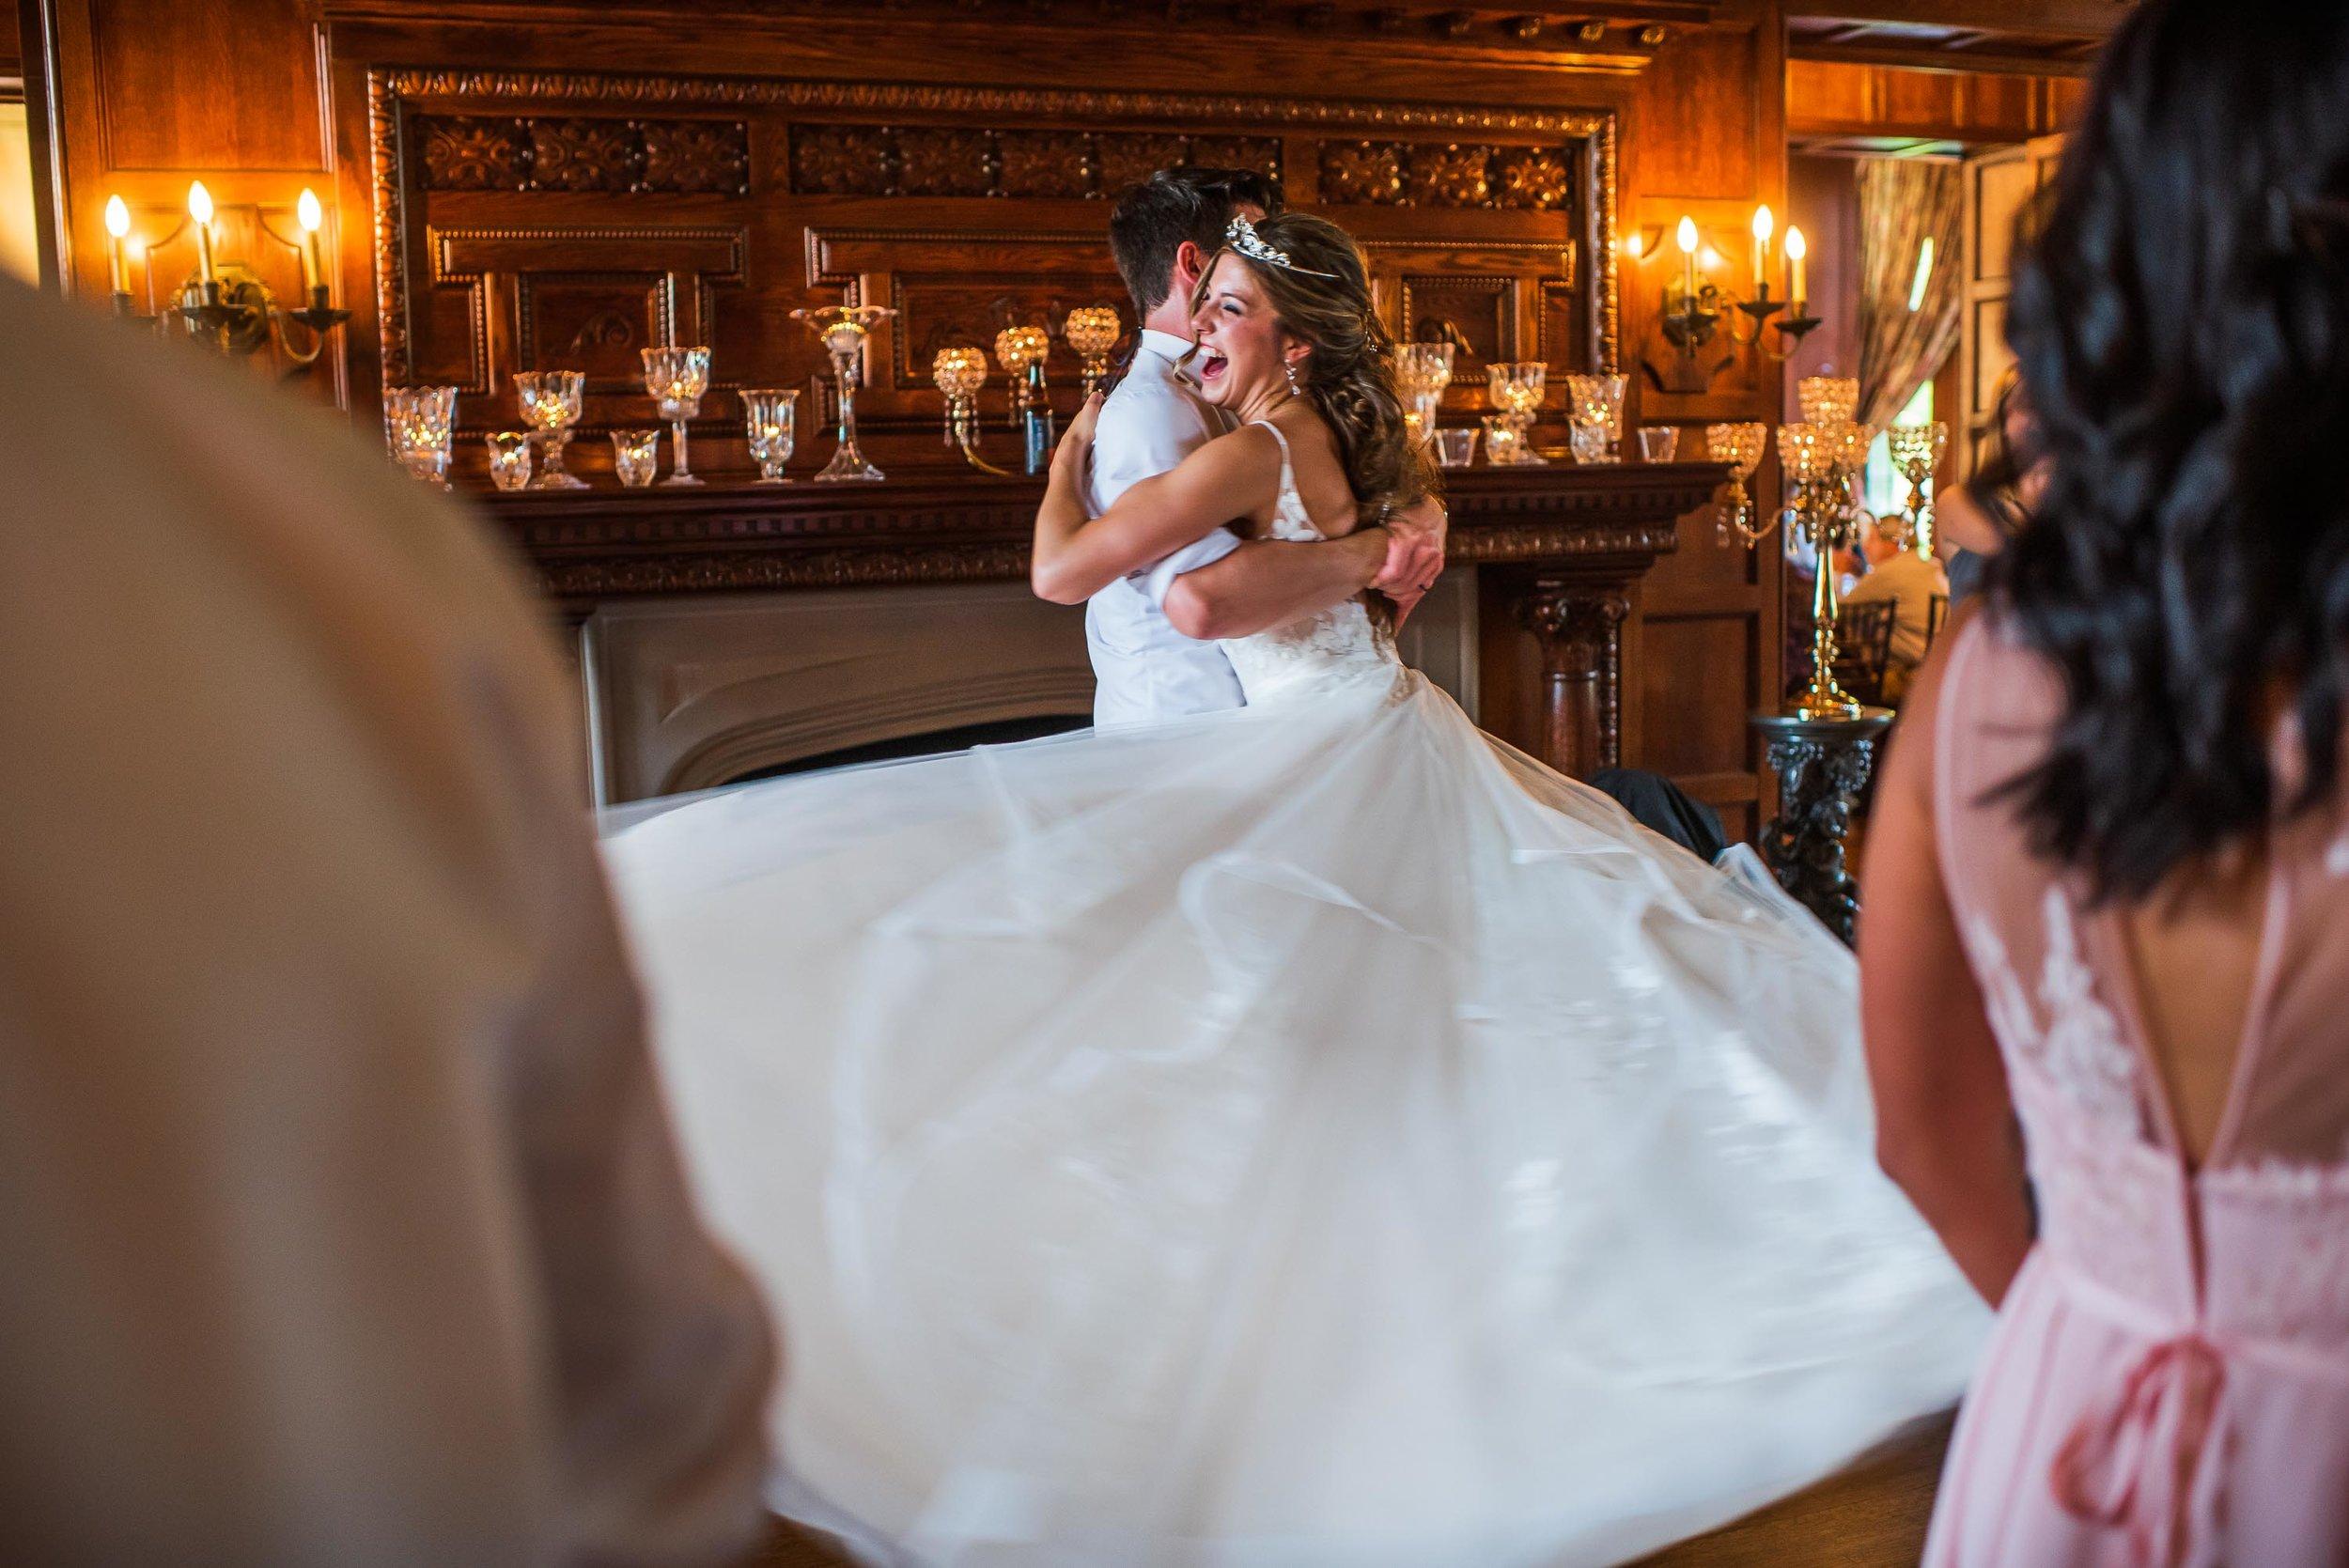 thornewood castle wedding 76.jpg